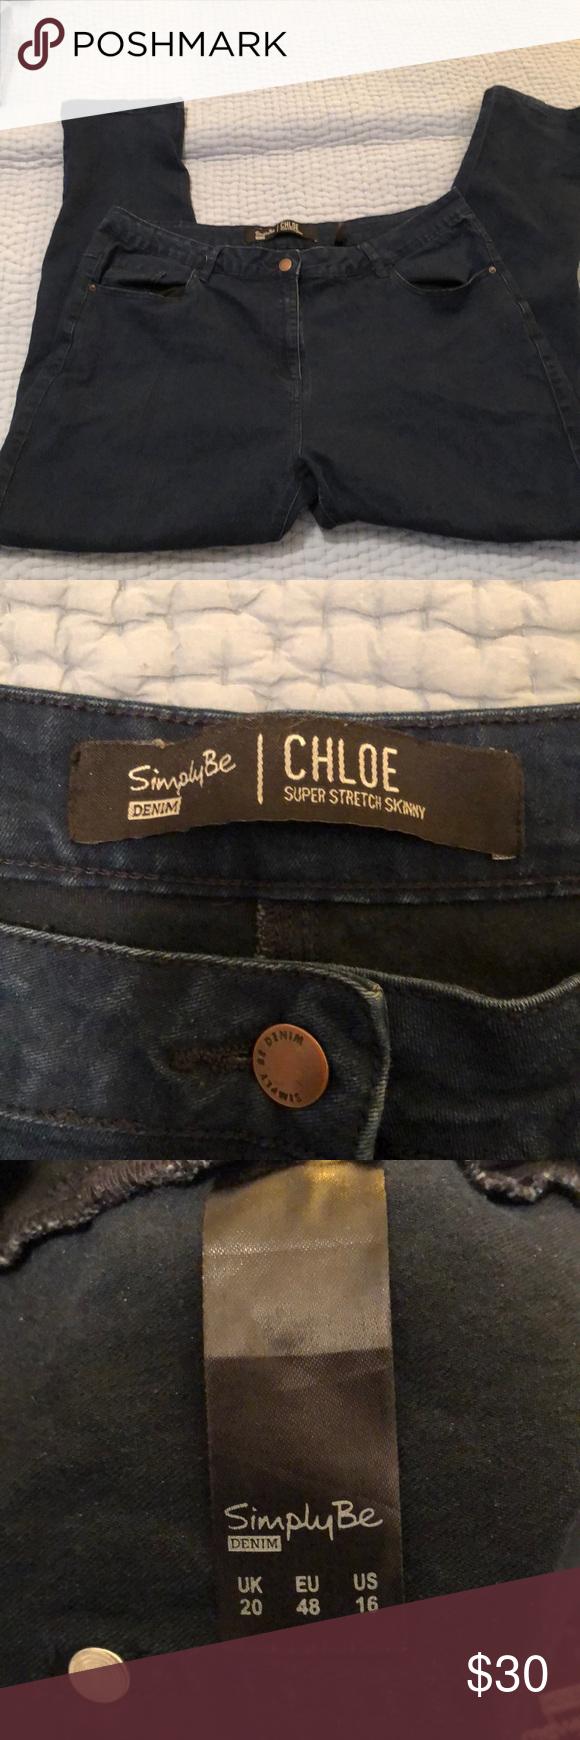 6cd192b20e SimplyBe Chloe Super Stretch Skinny Jeans Stretchy, lightweight ...